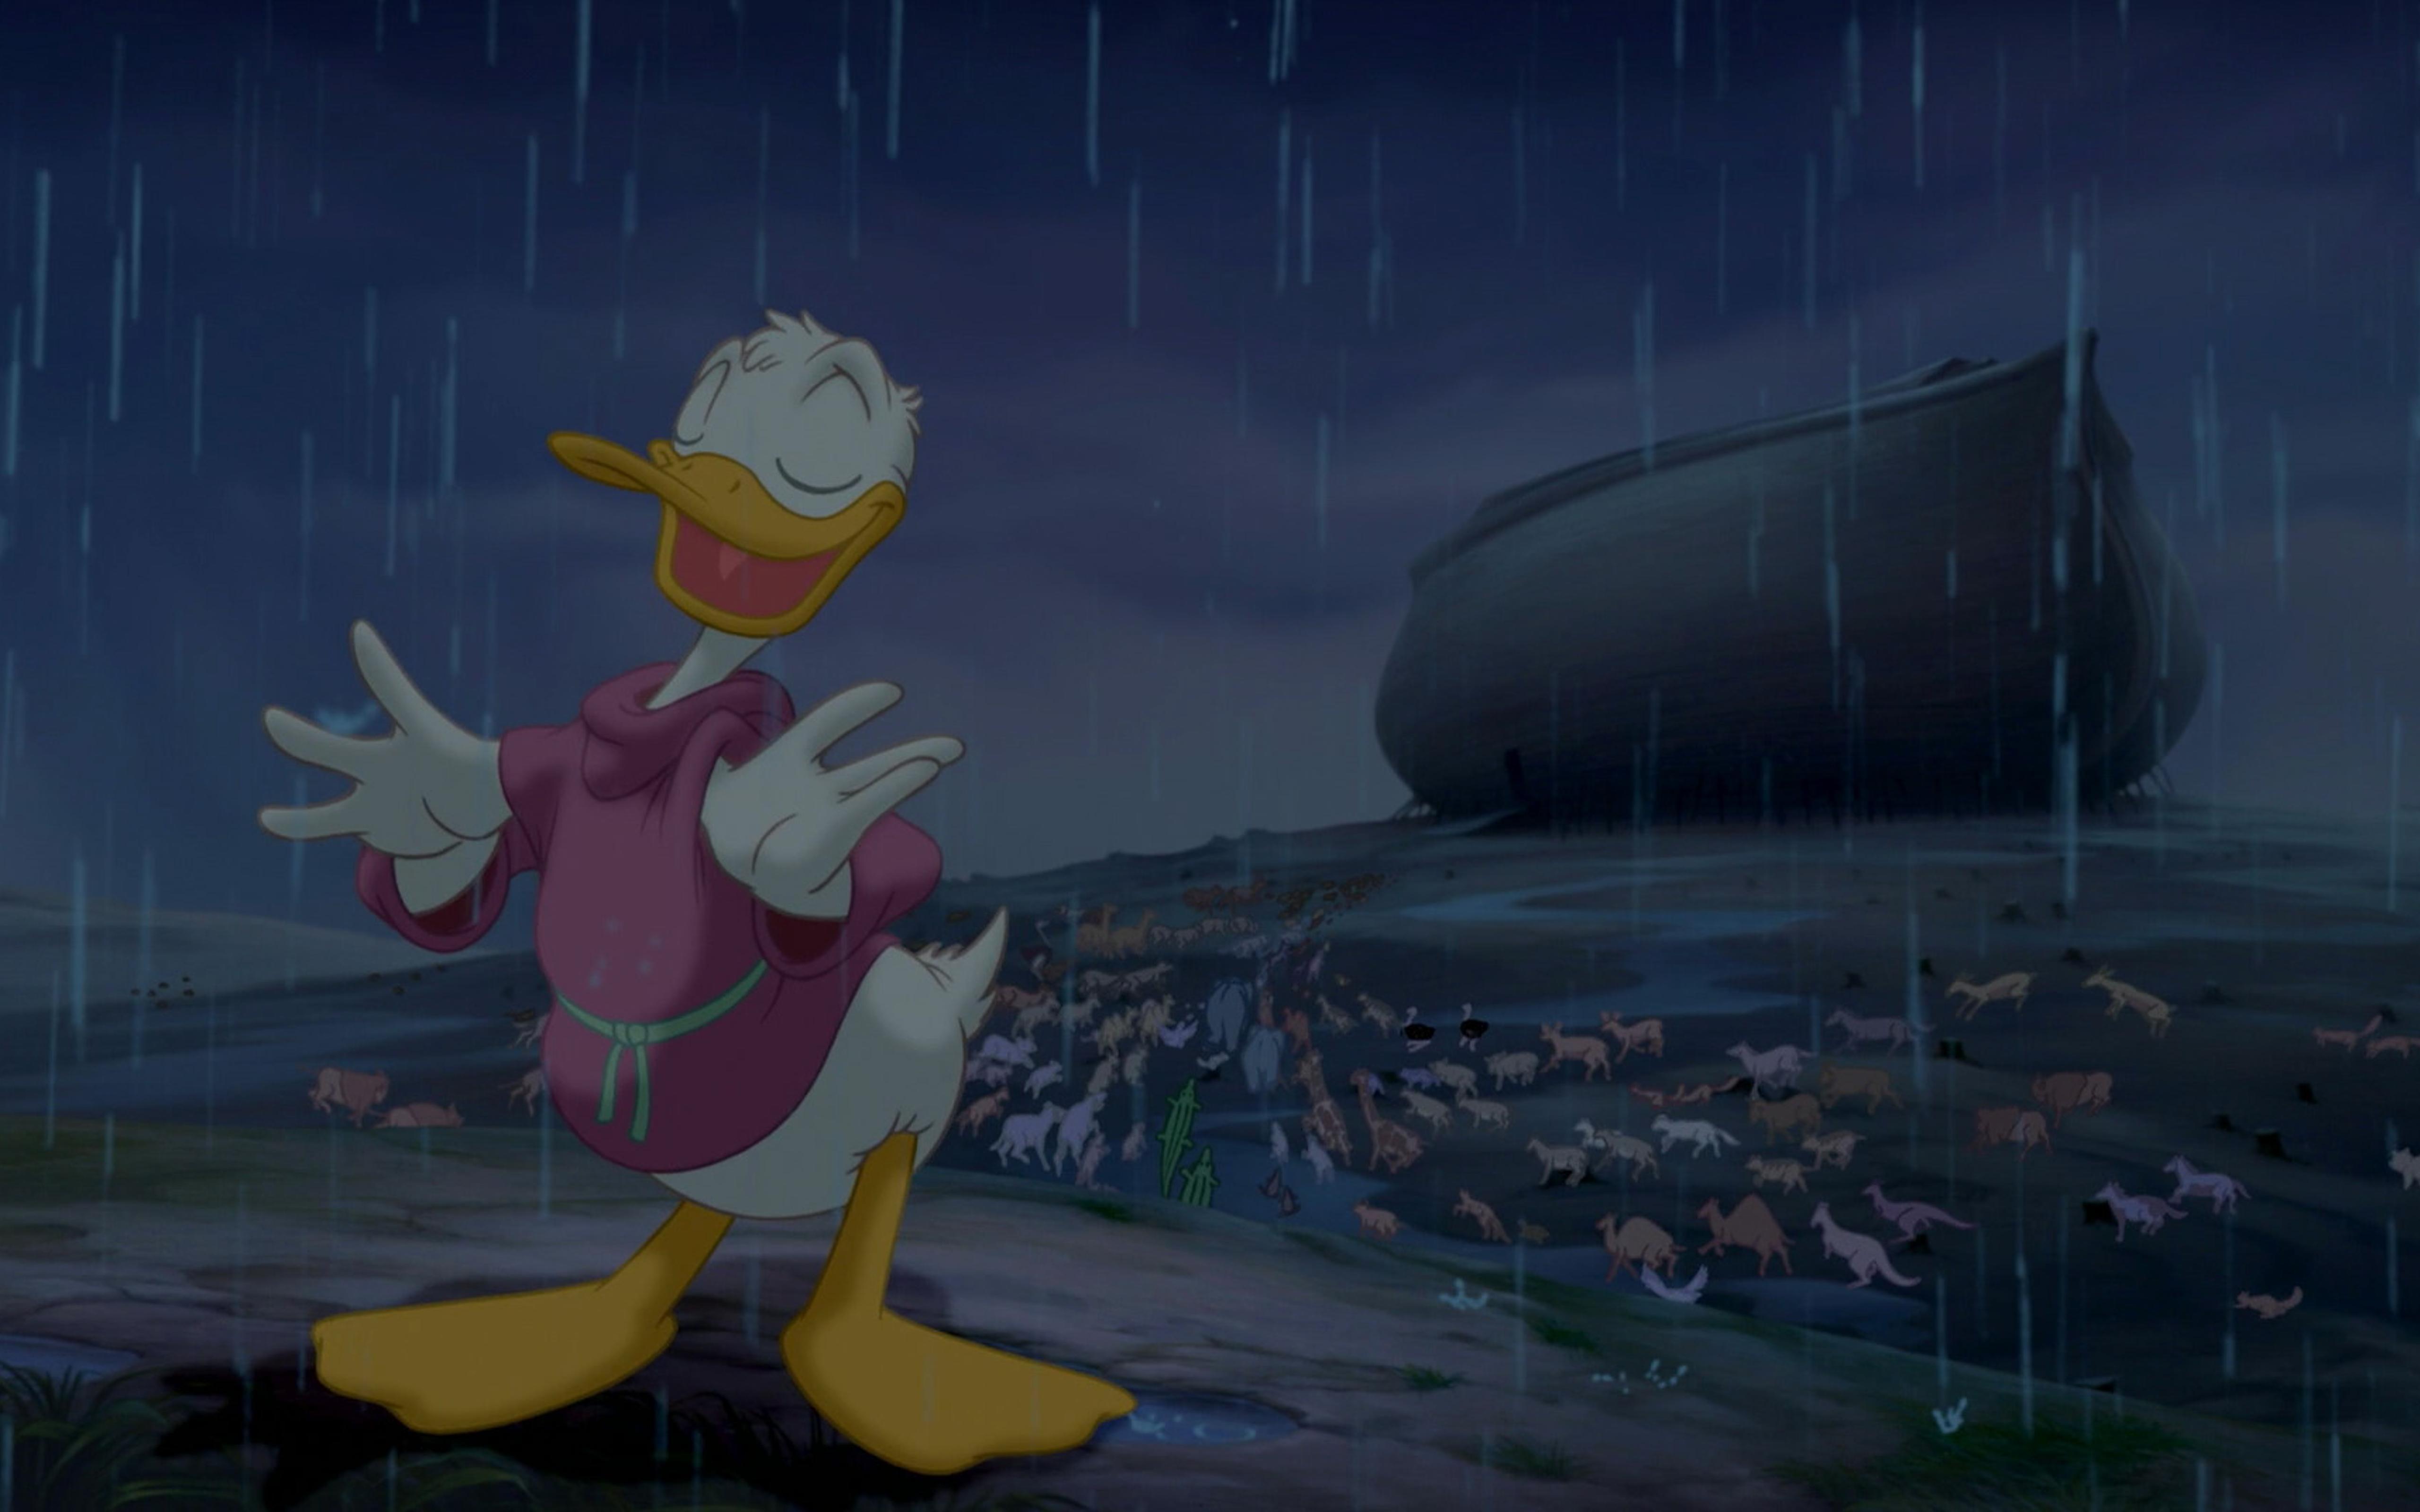 Best Wallpaper Night Cartoon - donald-duck-standing-in-the-rain-at-night-5120x3200  Image.jpg